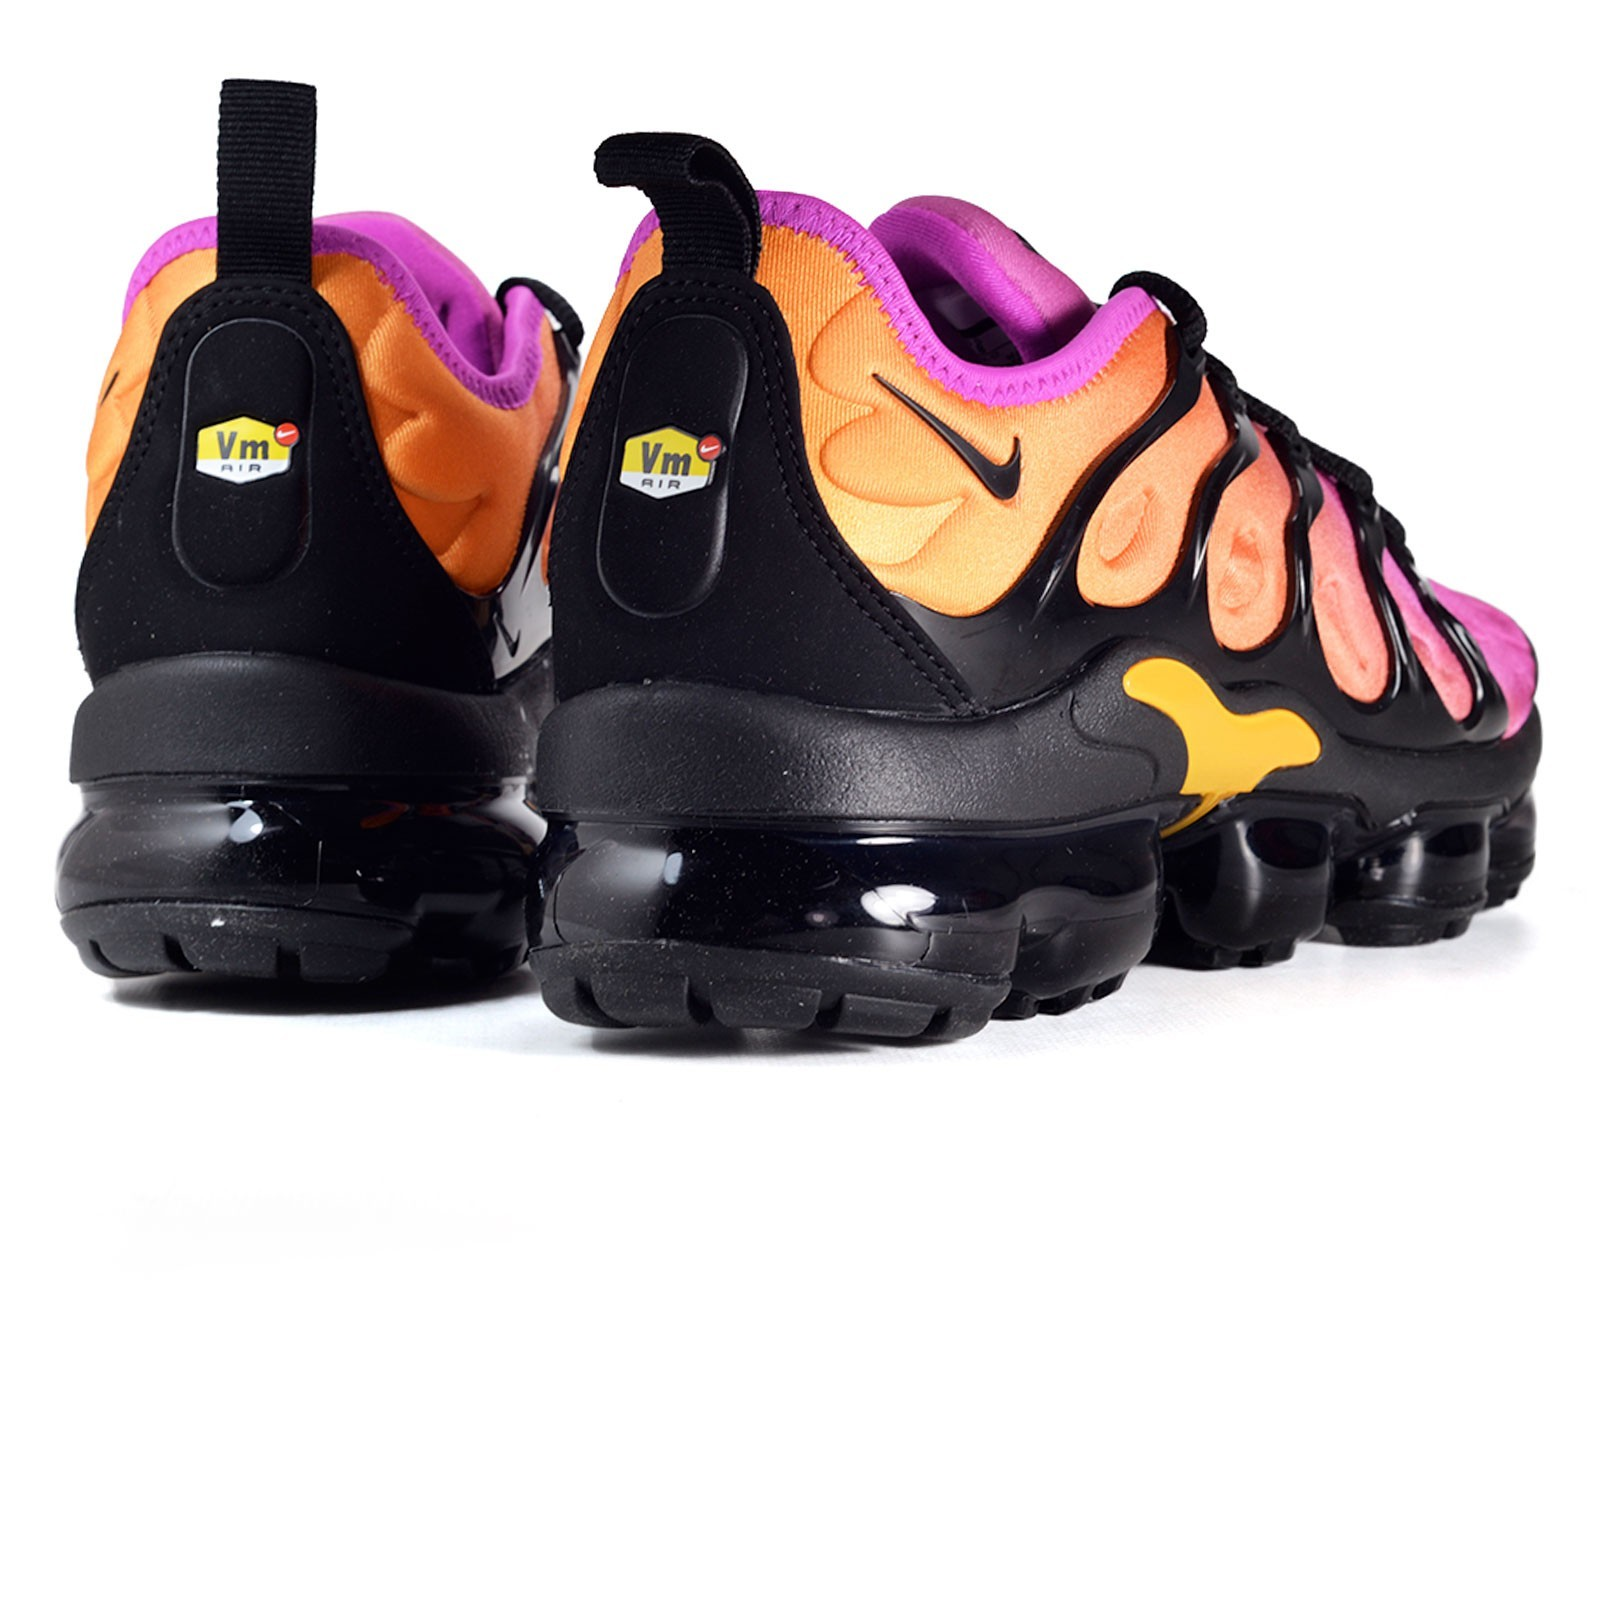 competitive price d97a3 b49b9 Scarpe donna sneakers NIKE AIR VAPORMAX PLUS in tessuto sintetico  multicolor AO4550-004